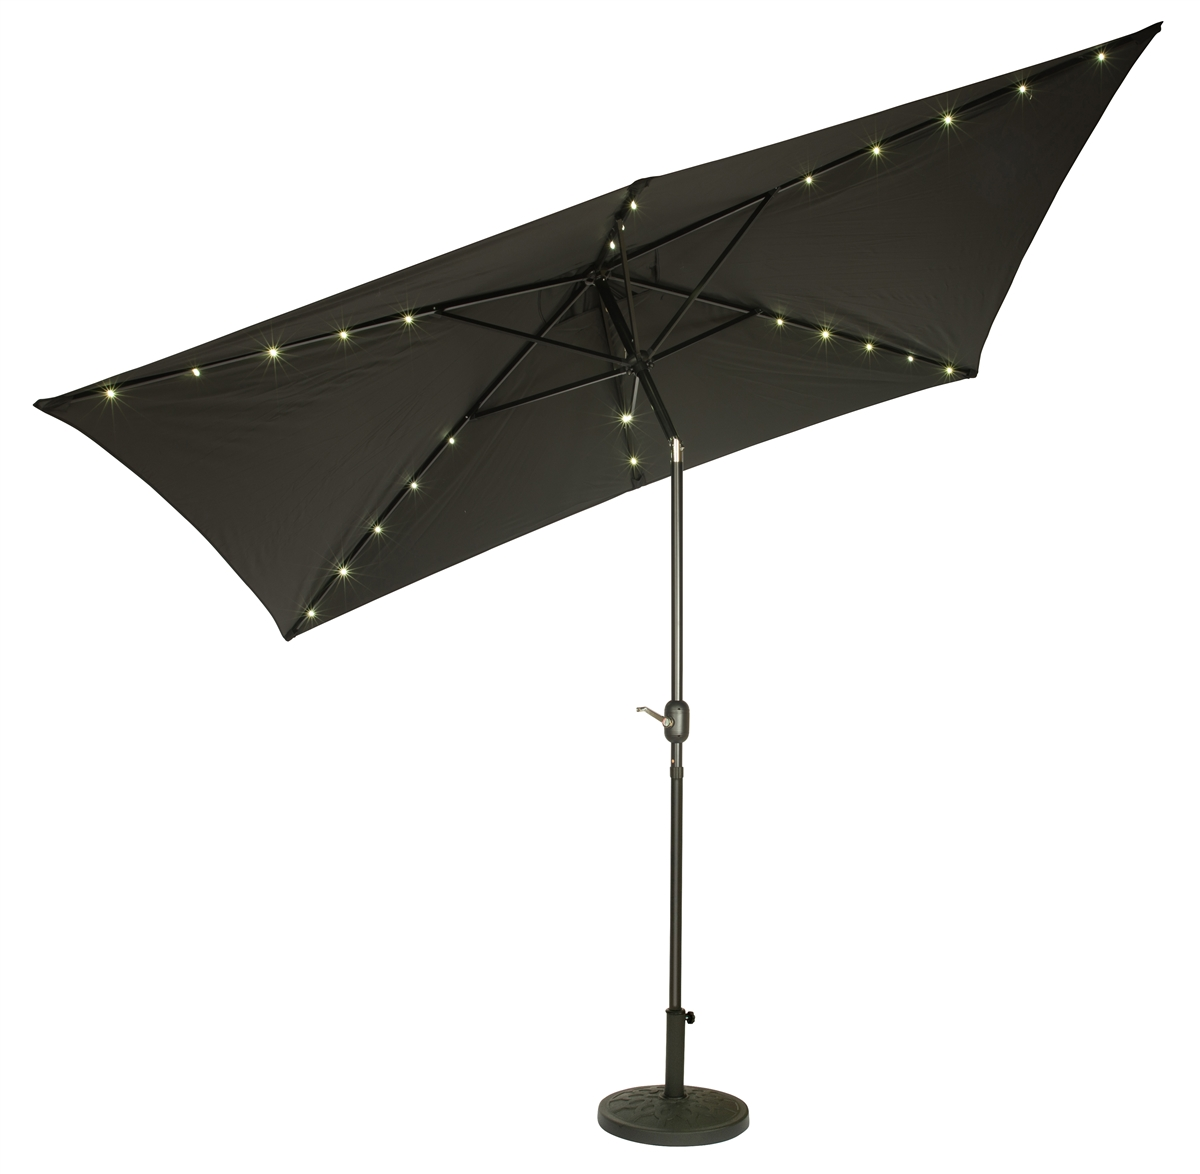 10u0027 X 6.5u0027 Rectangular Solar Powered LED Lighted Patio Umbrella By  Trademark Innovations (Black)